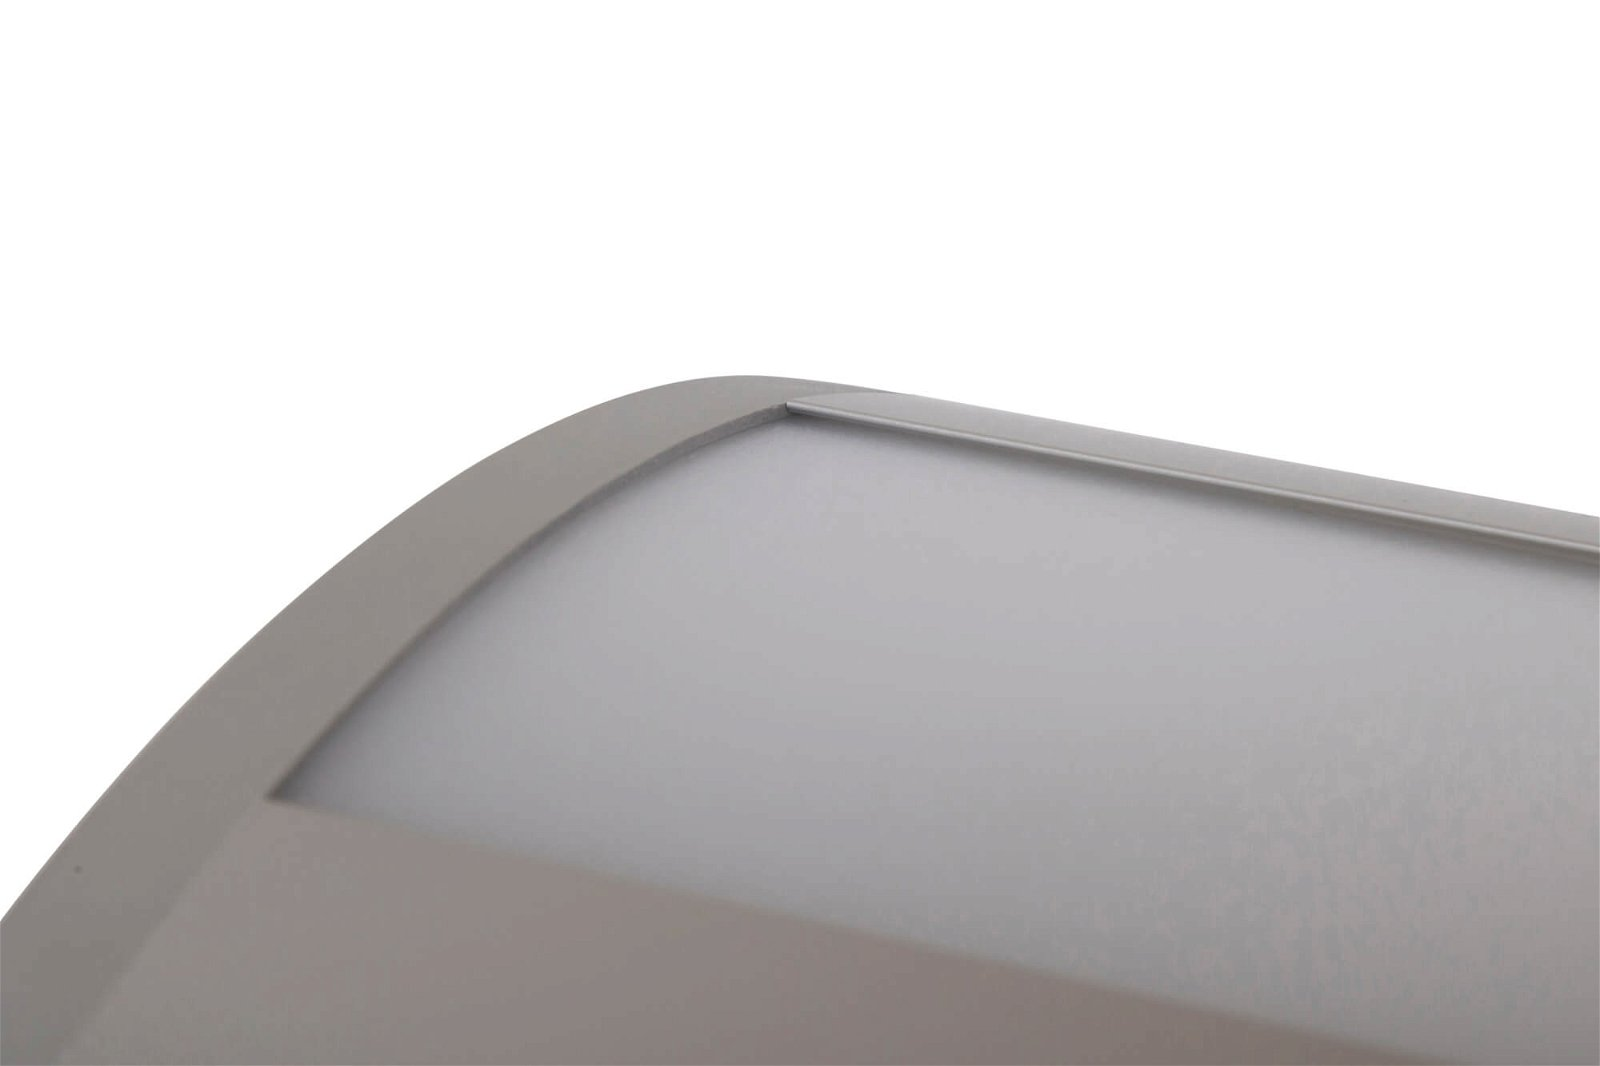 LED-Pendelleuchte MAULeye, 37 W, 122,5 cm, silber